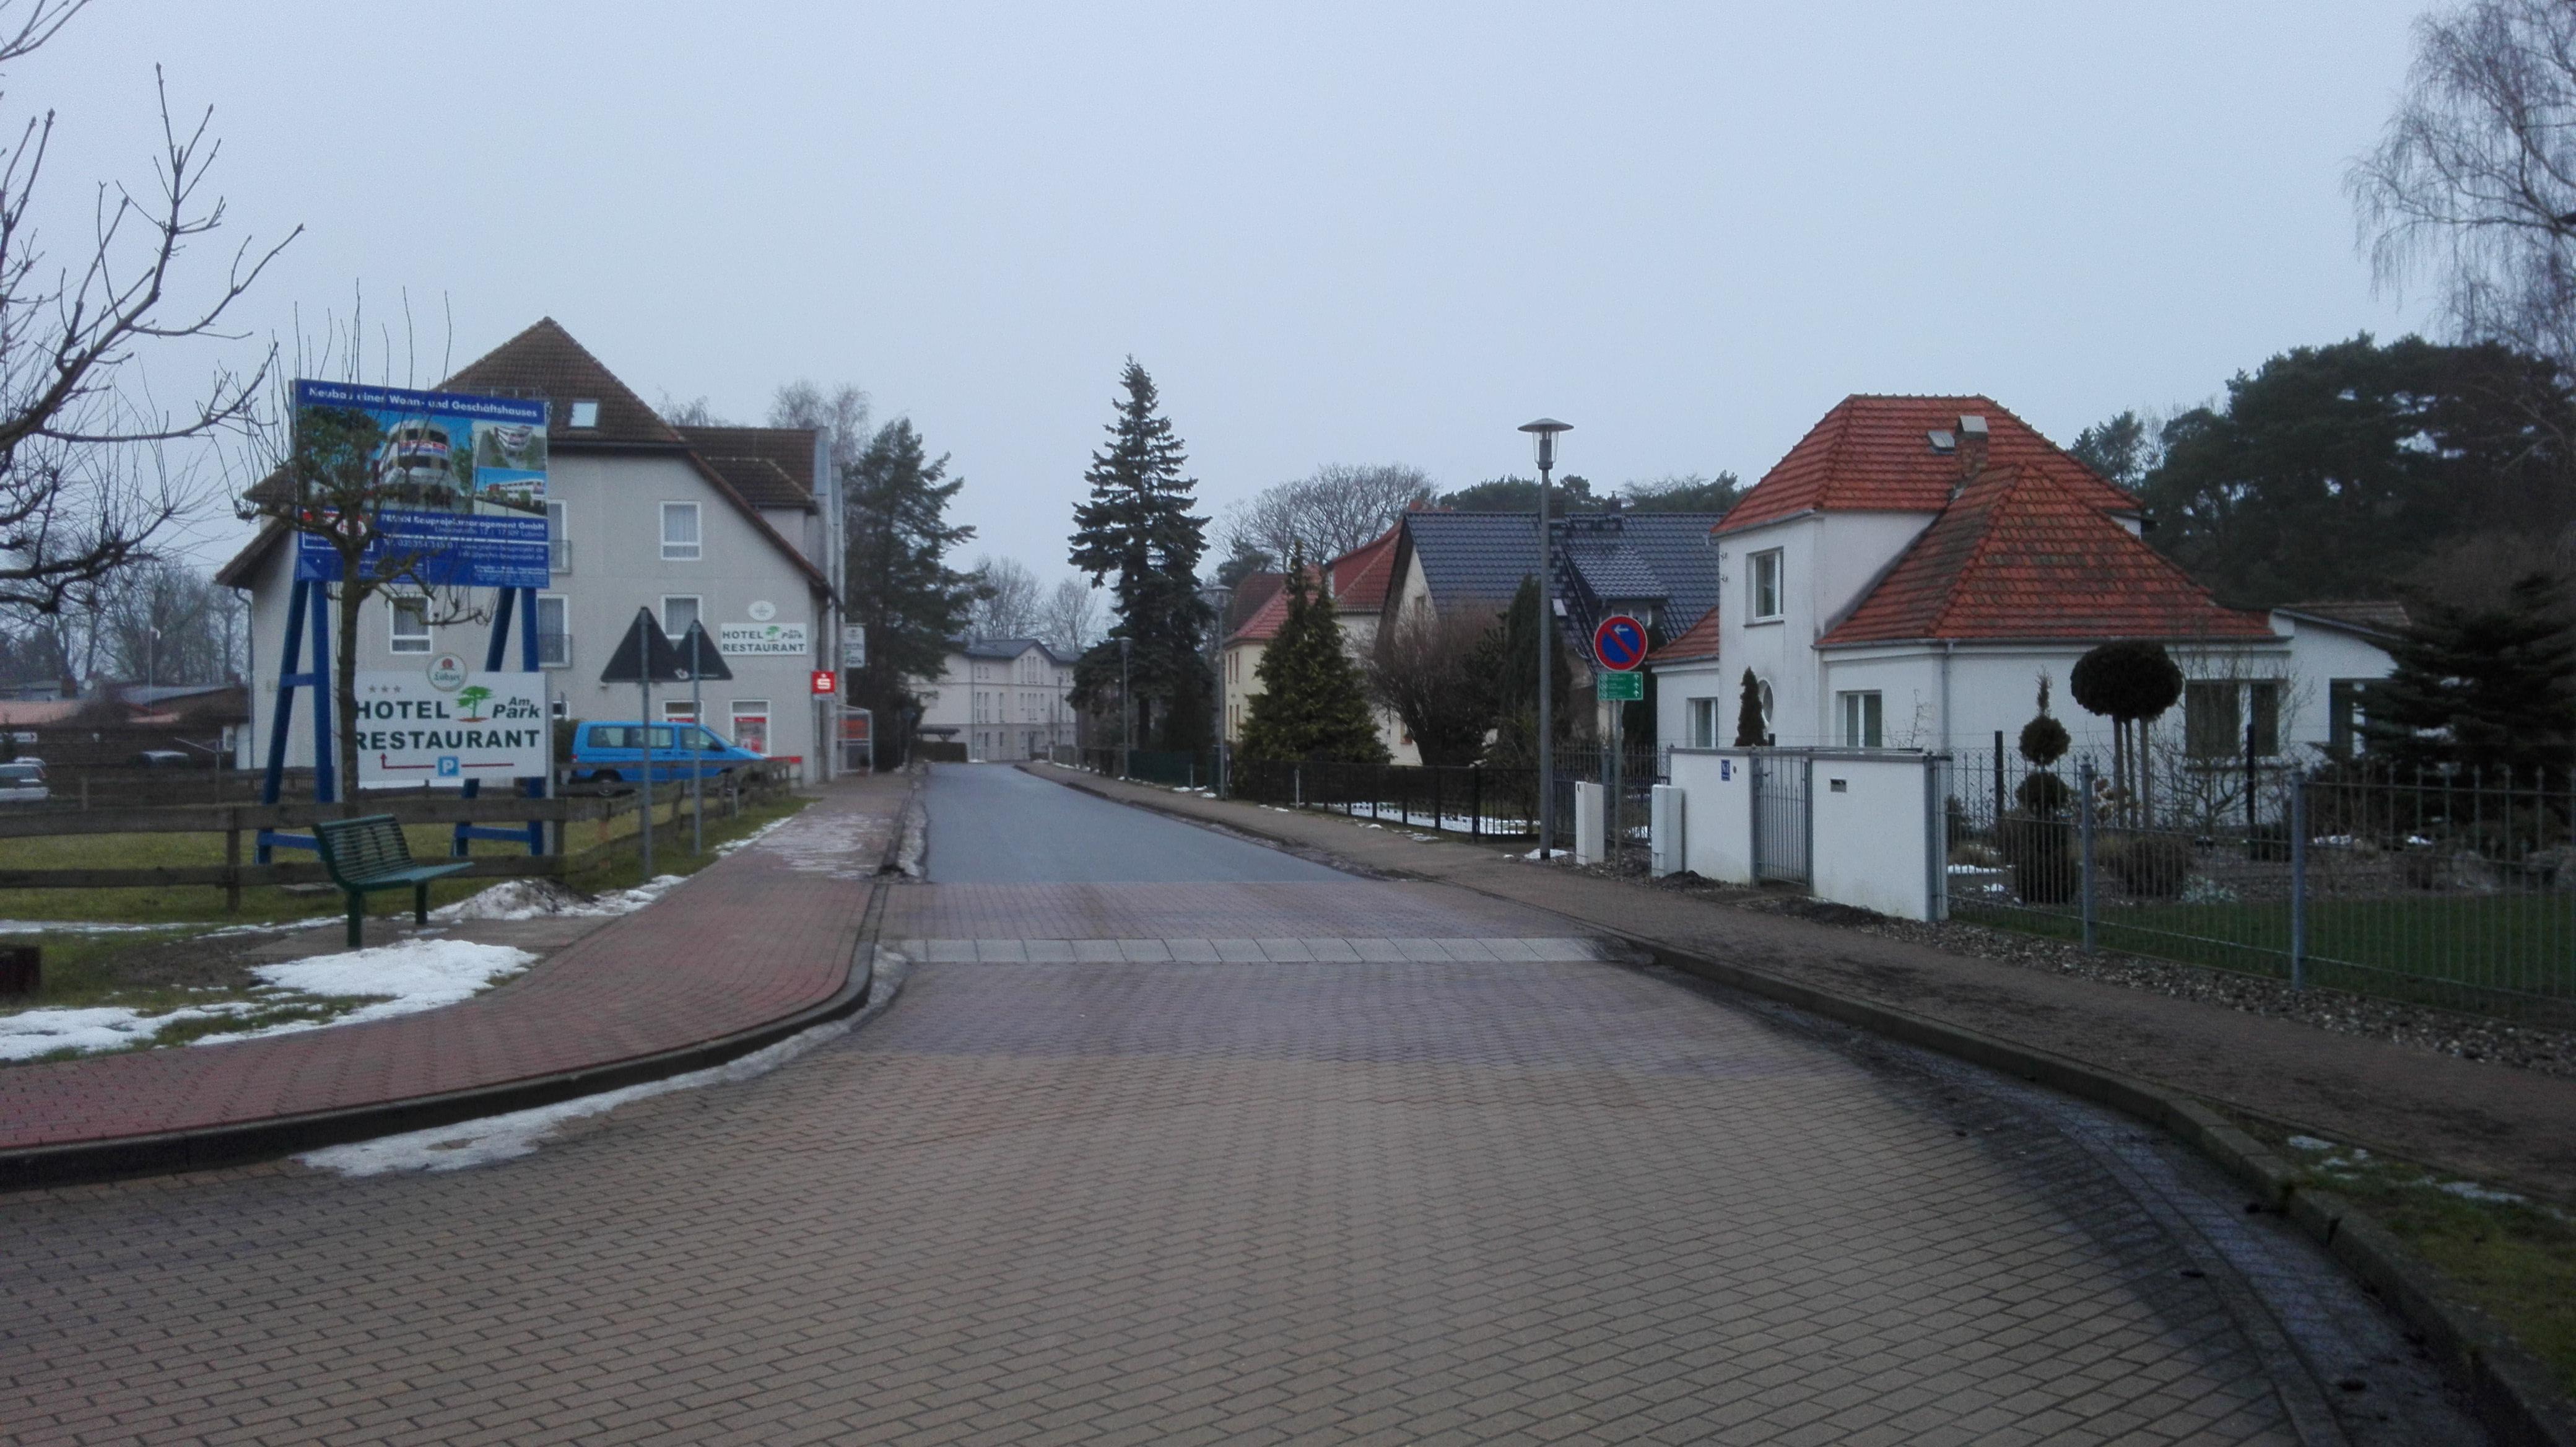 Villenstraße - Dünenstraße, Lubmin